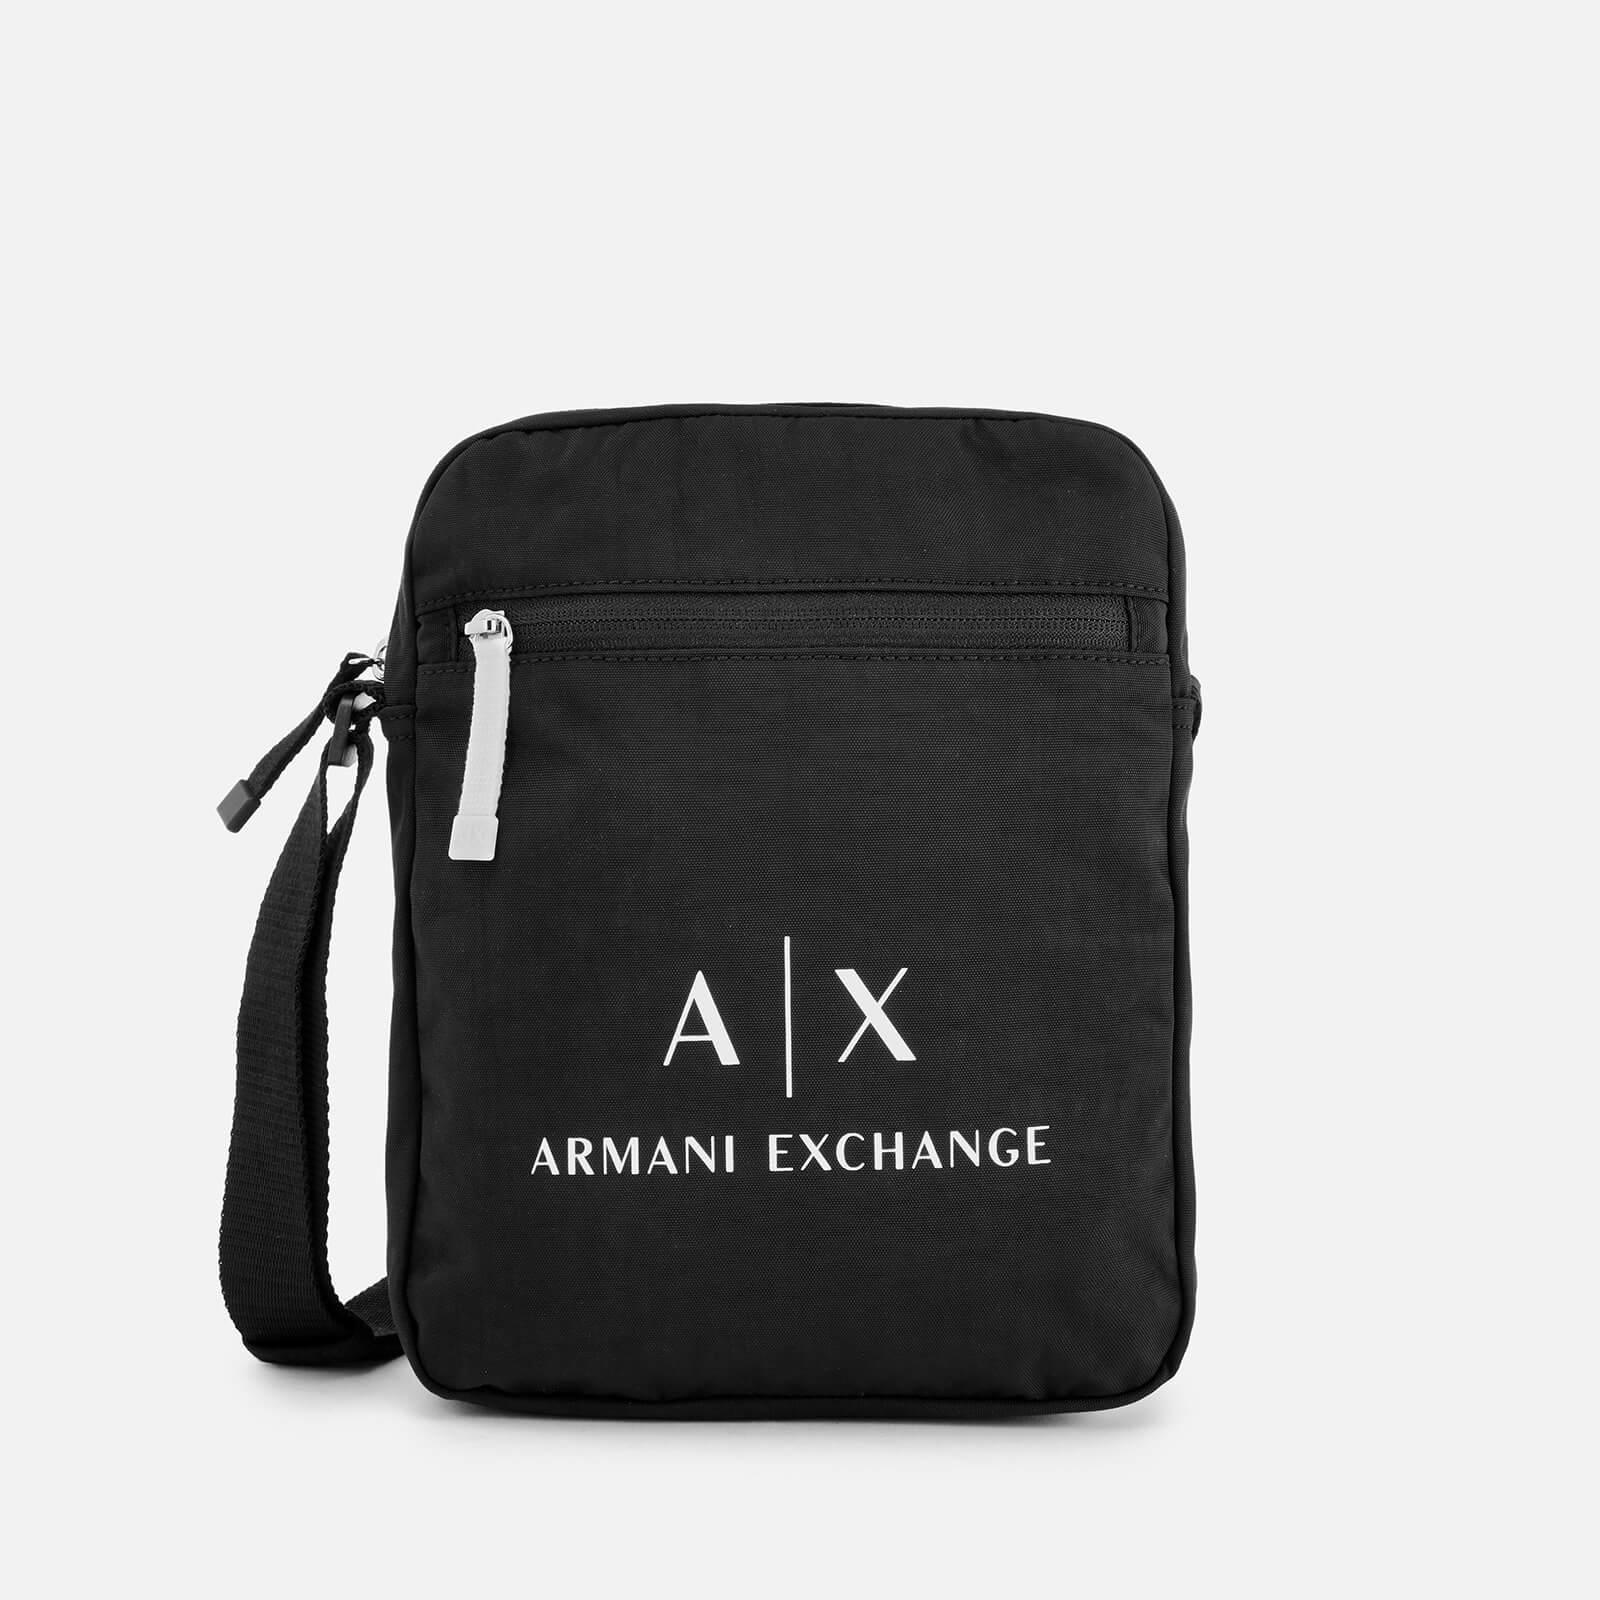 9f29432df16c Armani Exchange - Black Contrast Logo Cross Body Bag for Men - Lyst. View  fullscreen